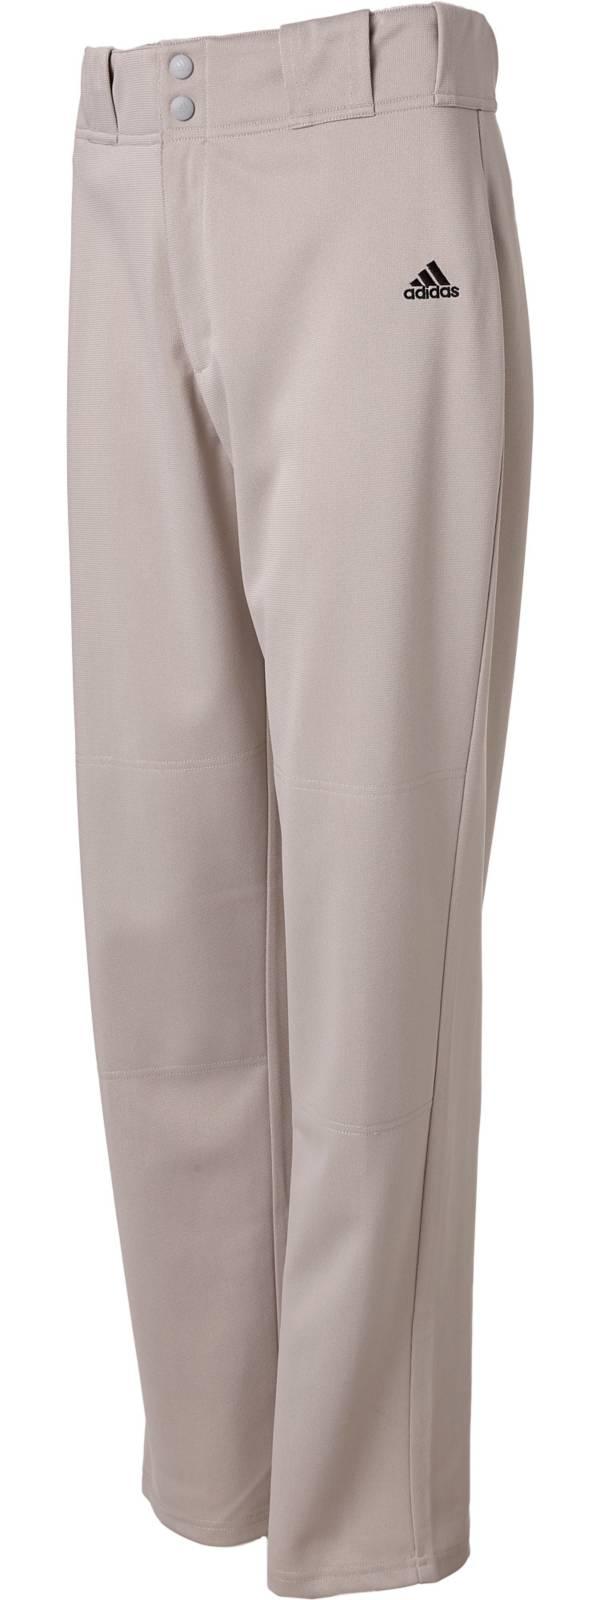 adidas Men's Phenom Open Bottom Baseball Pants product image